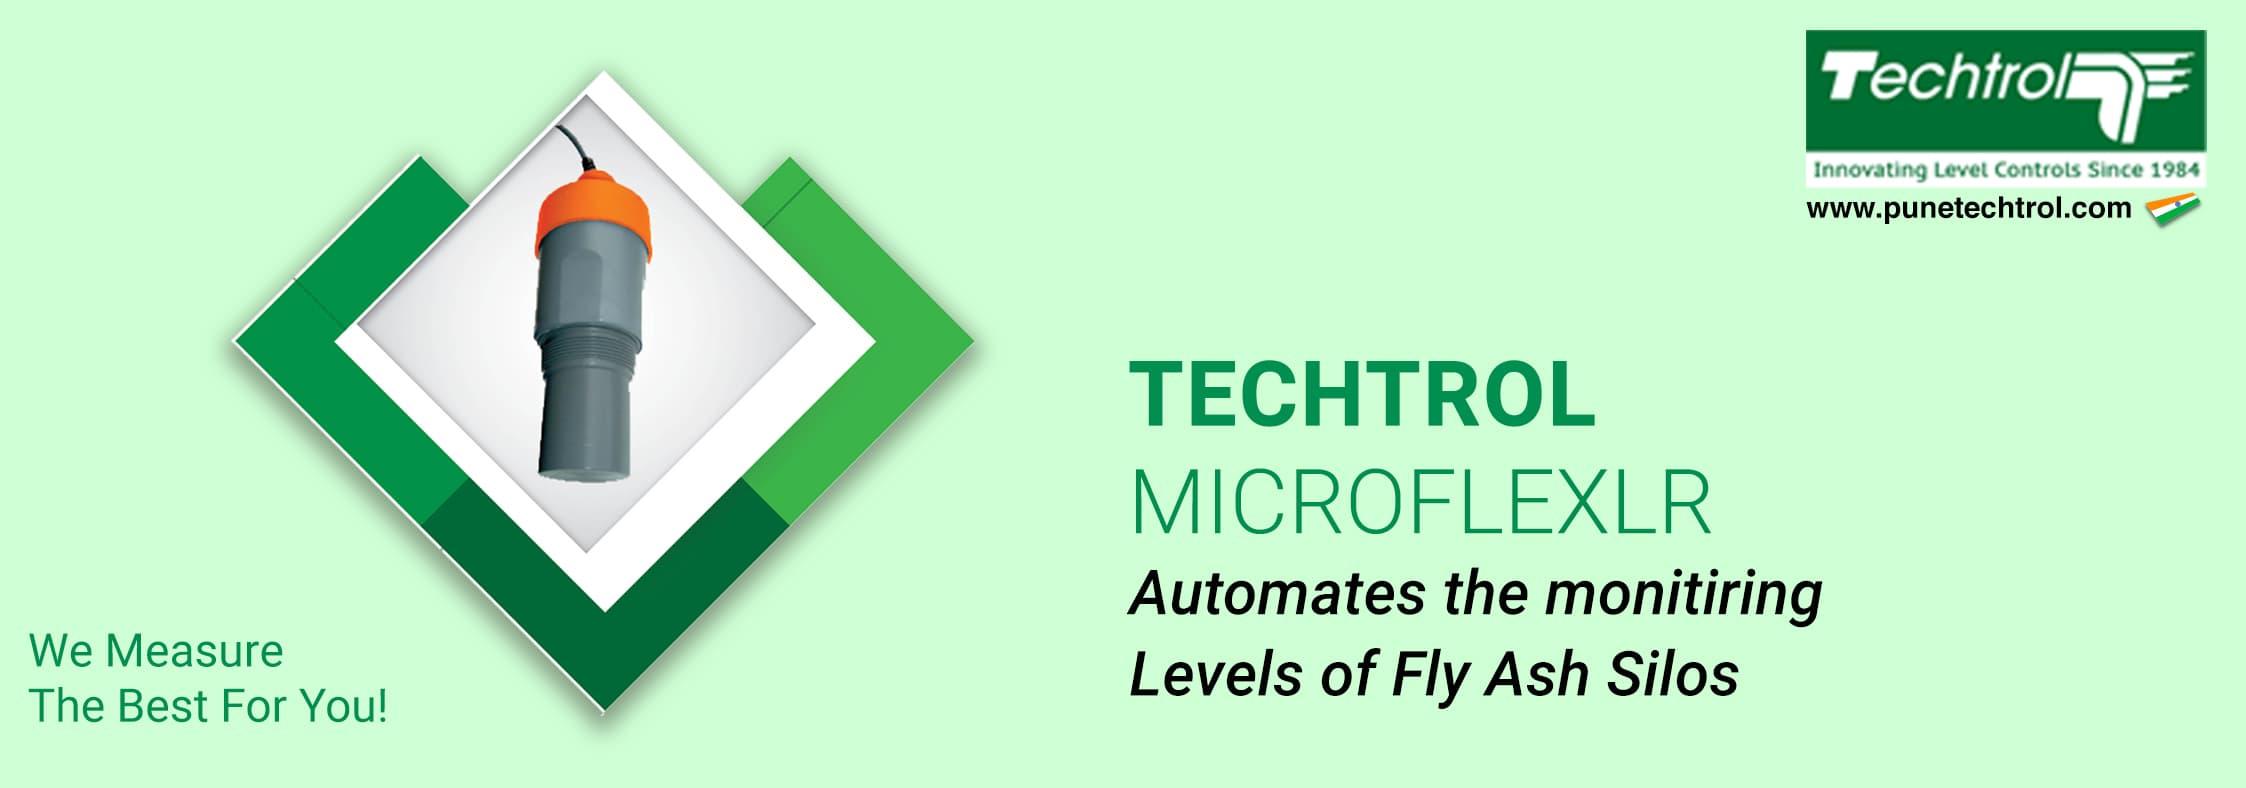 Techtrol Microflex LRon Fly Ash Silosof The Uttam Galva Steels